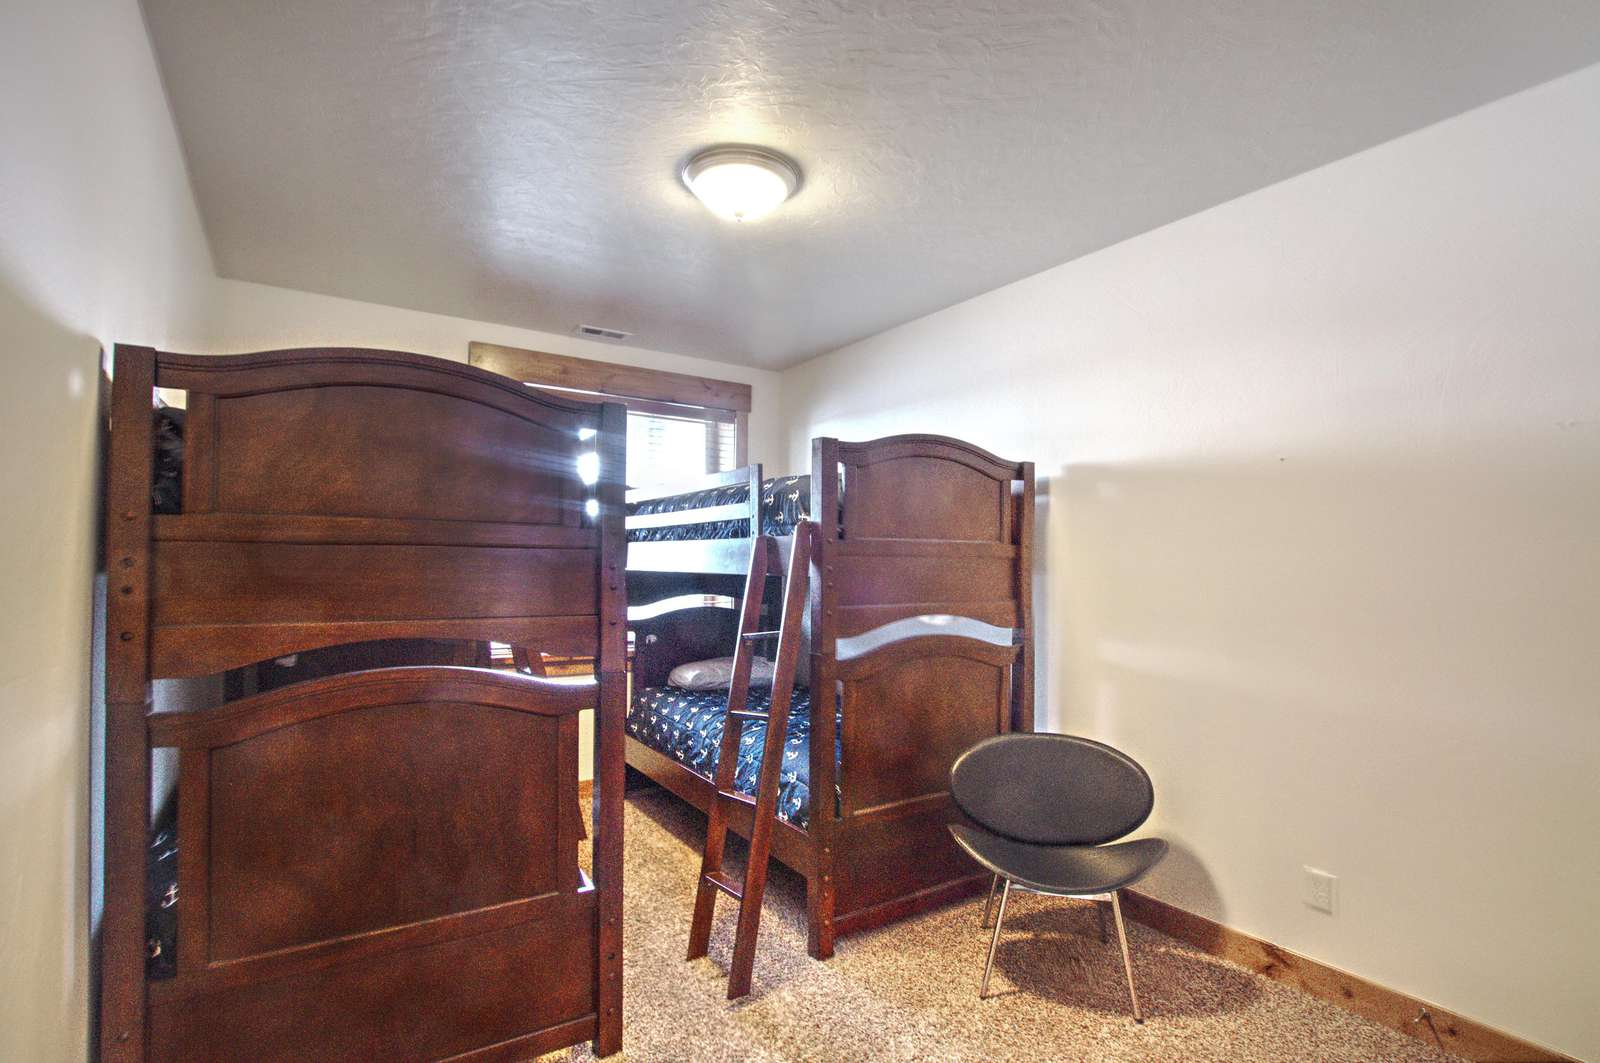 2nd basement bedroom